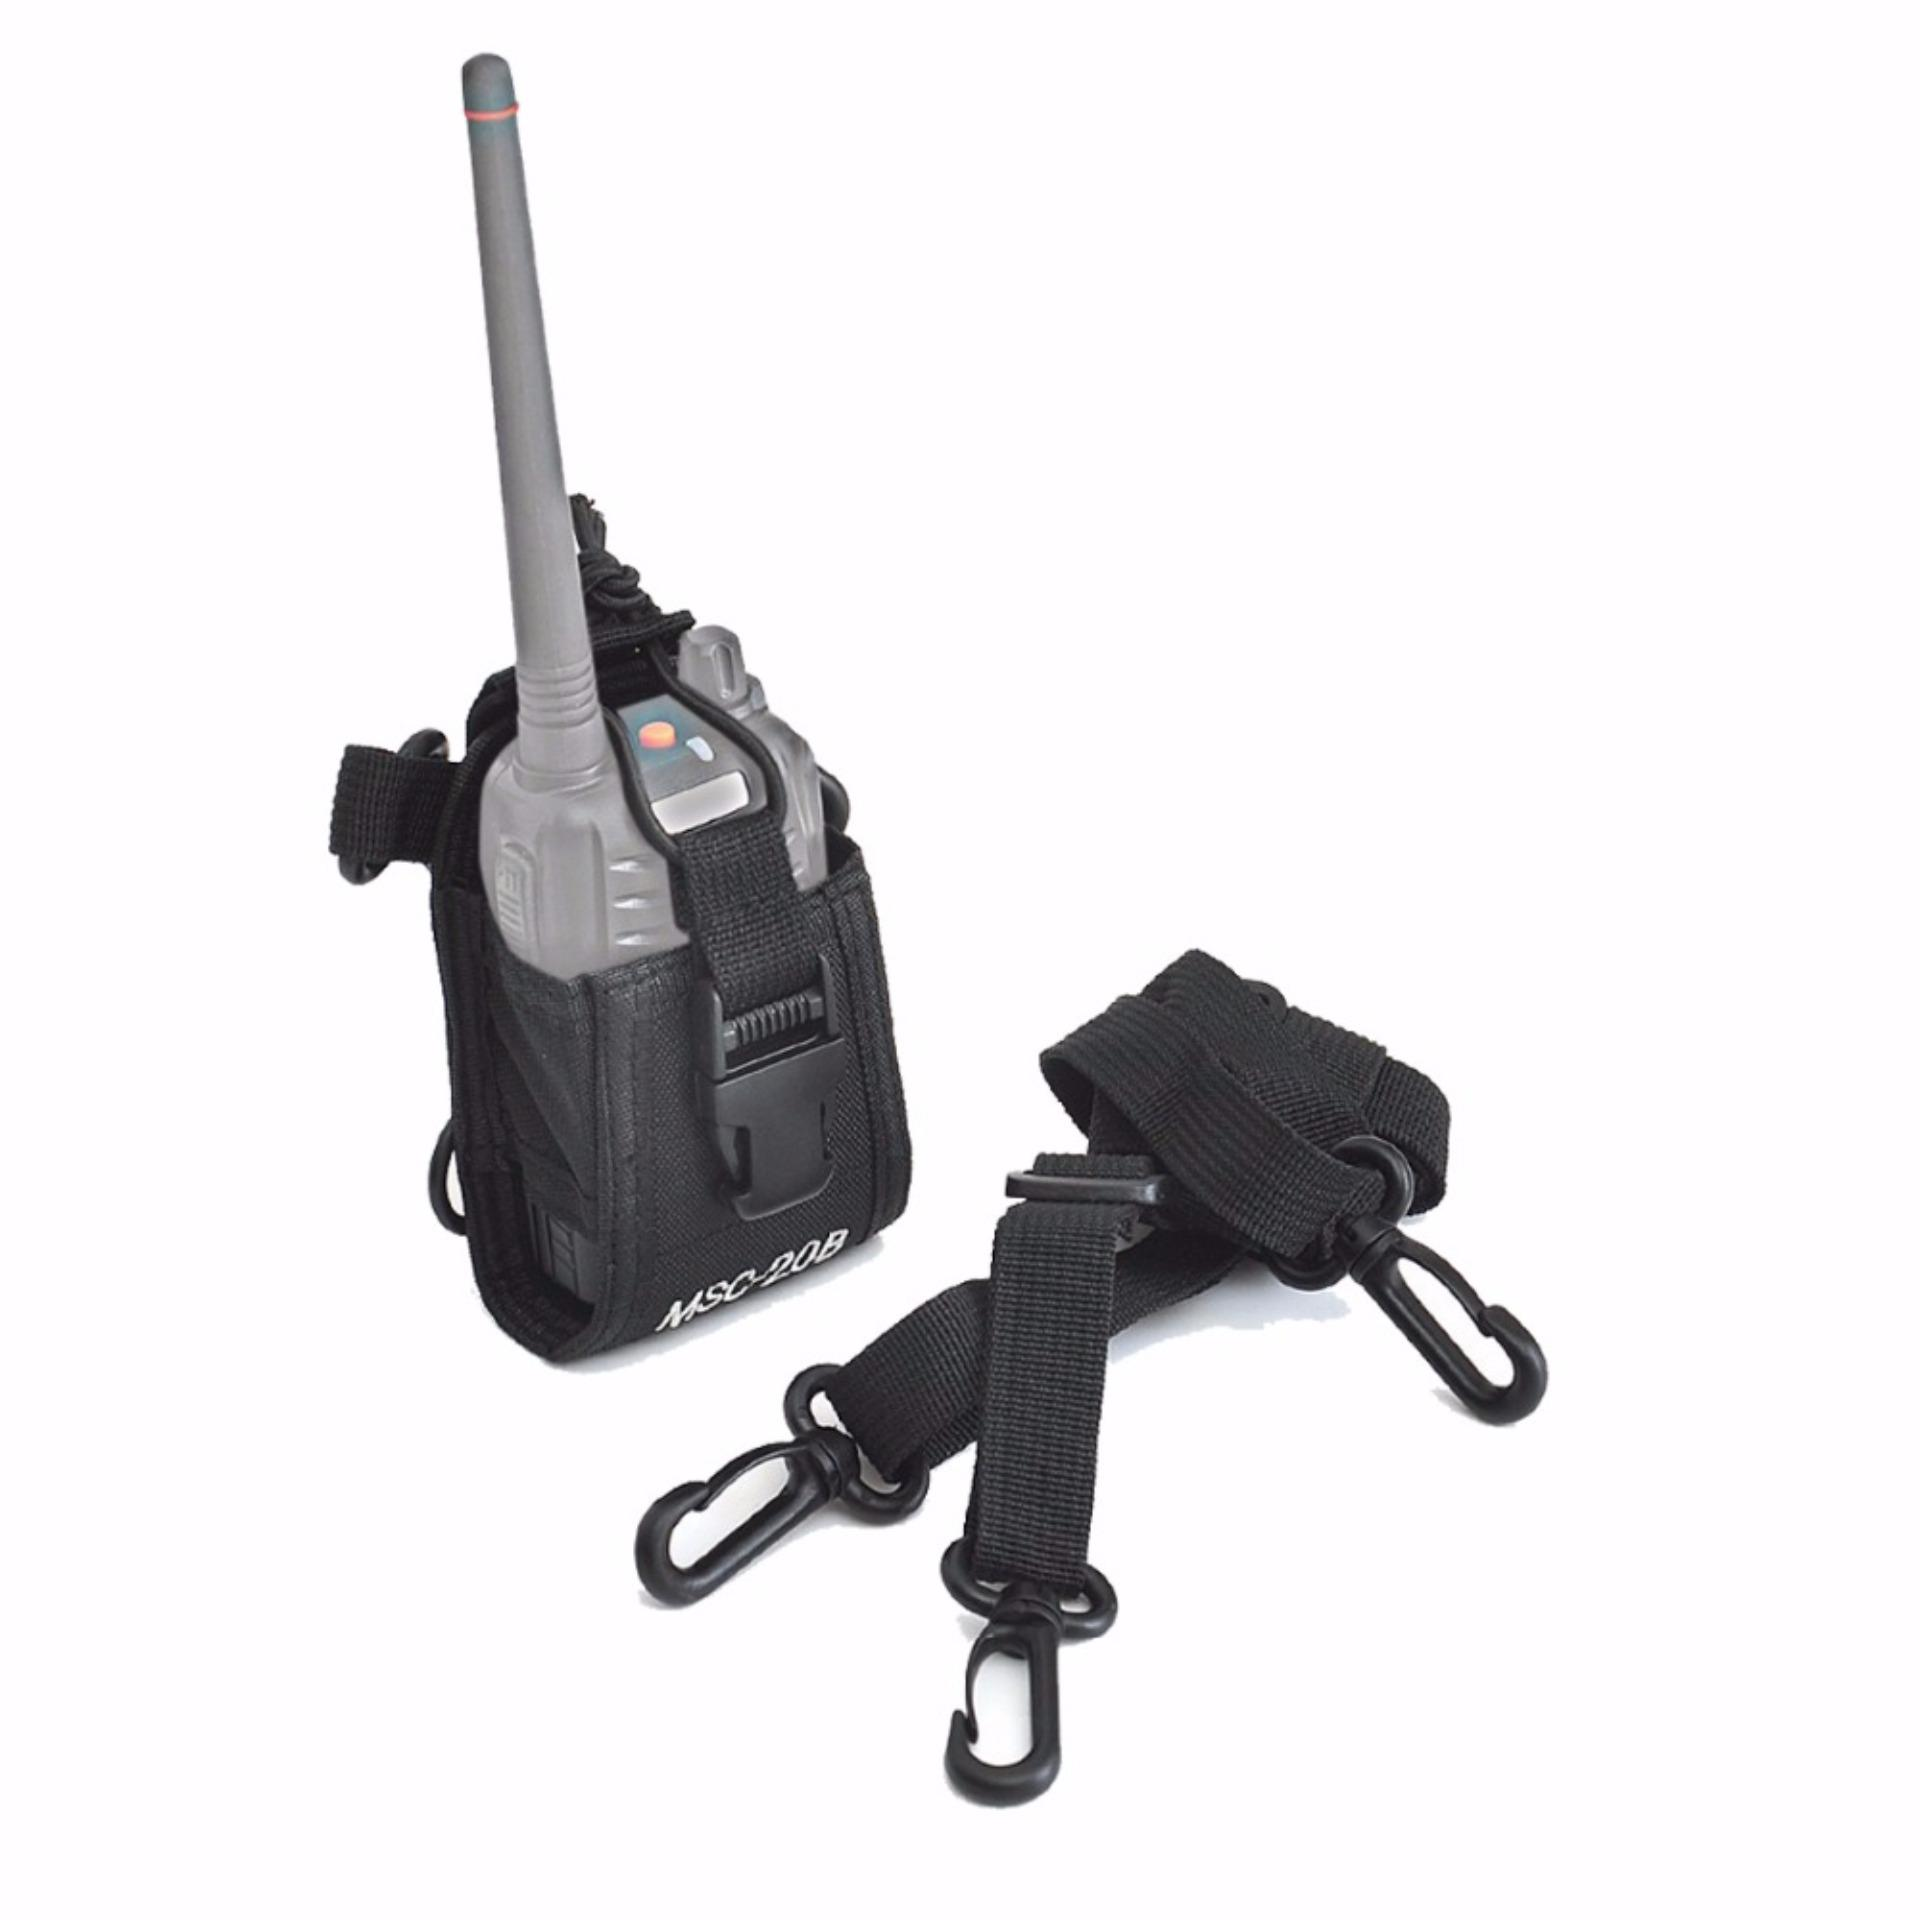 Radio Case Holder for H777 Baofeng 666S//888S Kenwood Yaesu Motorola GP338